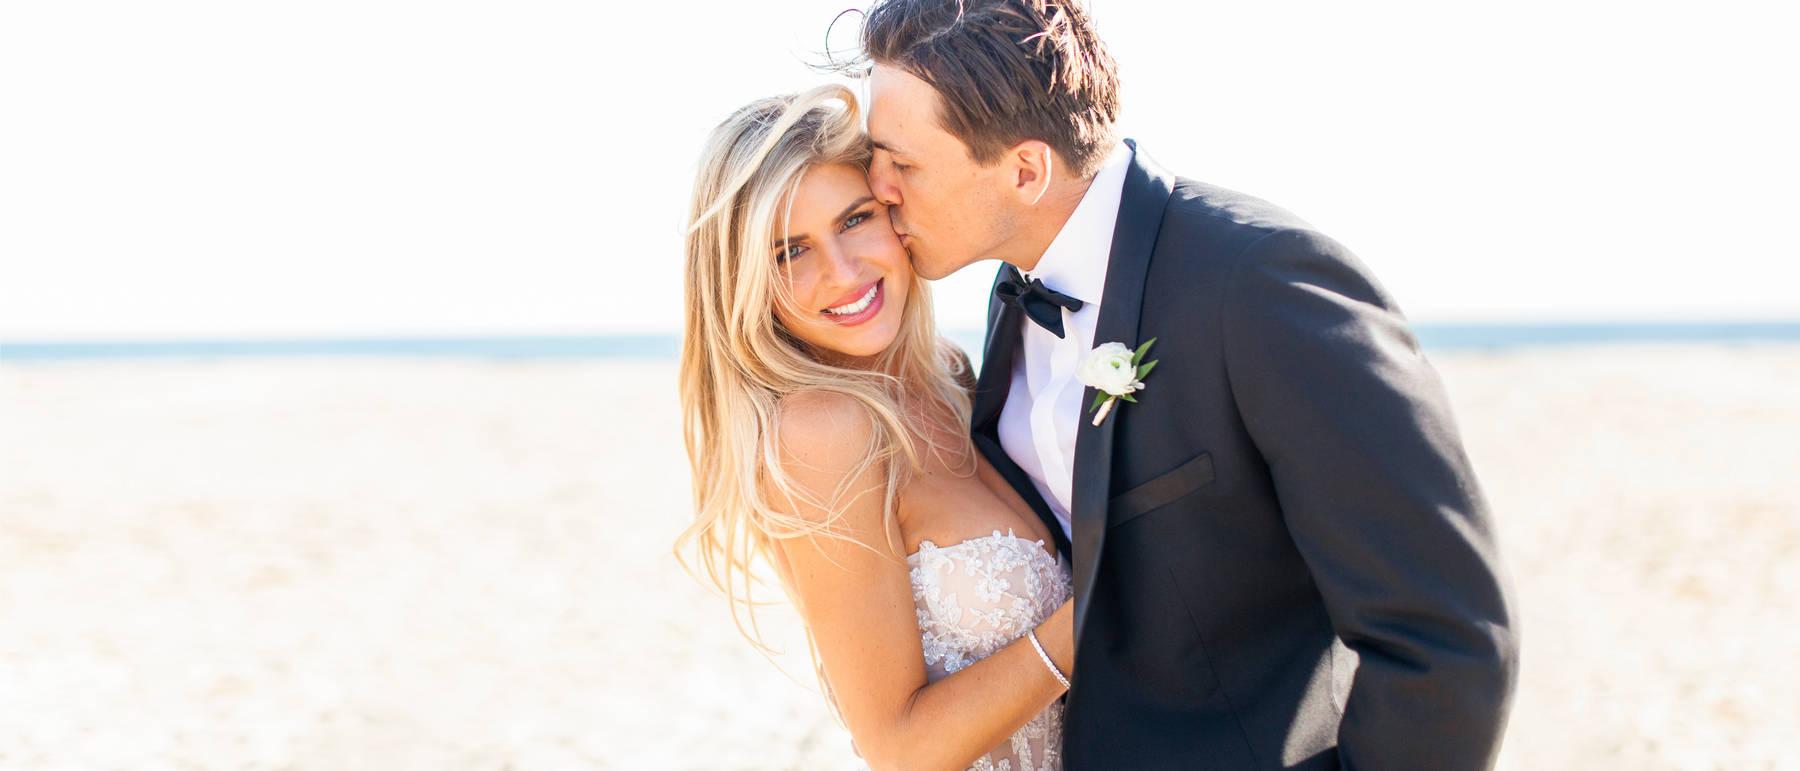 johnandjoseph-wedding-photographer-hz-slider-276